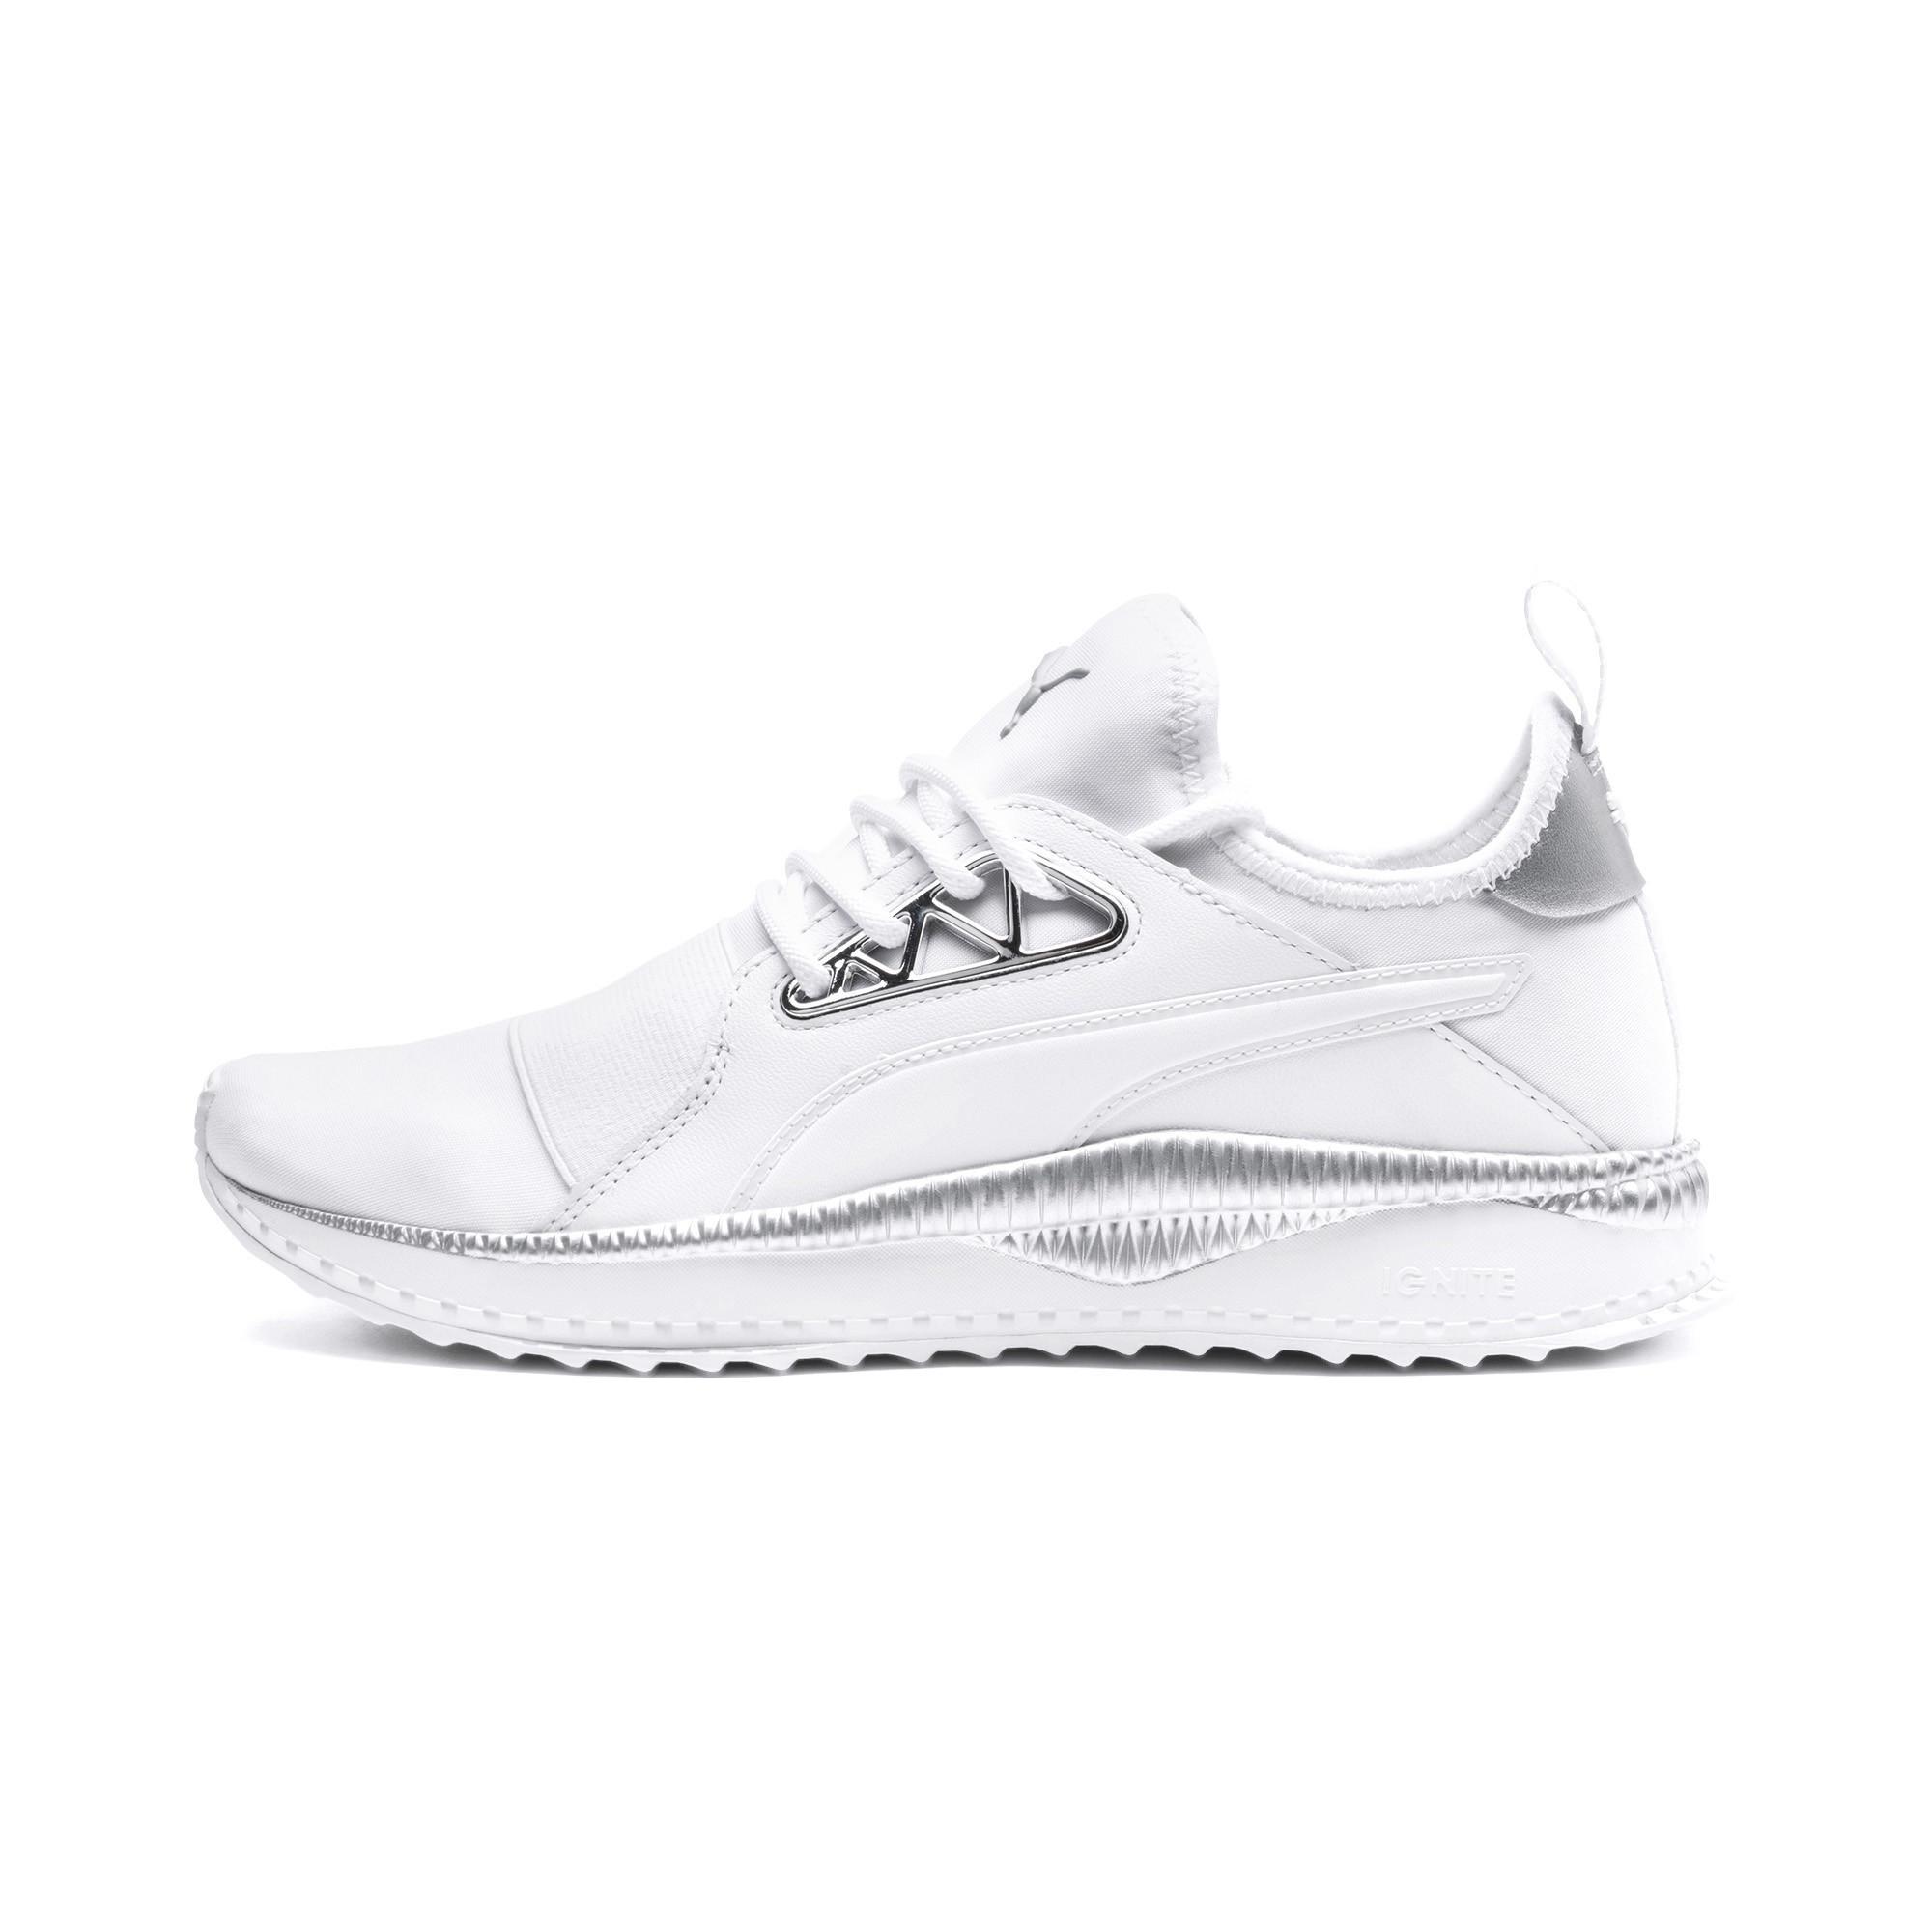 PUMA Rubber Tsugi Apex Jewel Sneaker in